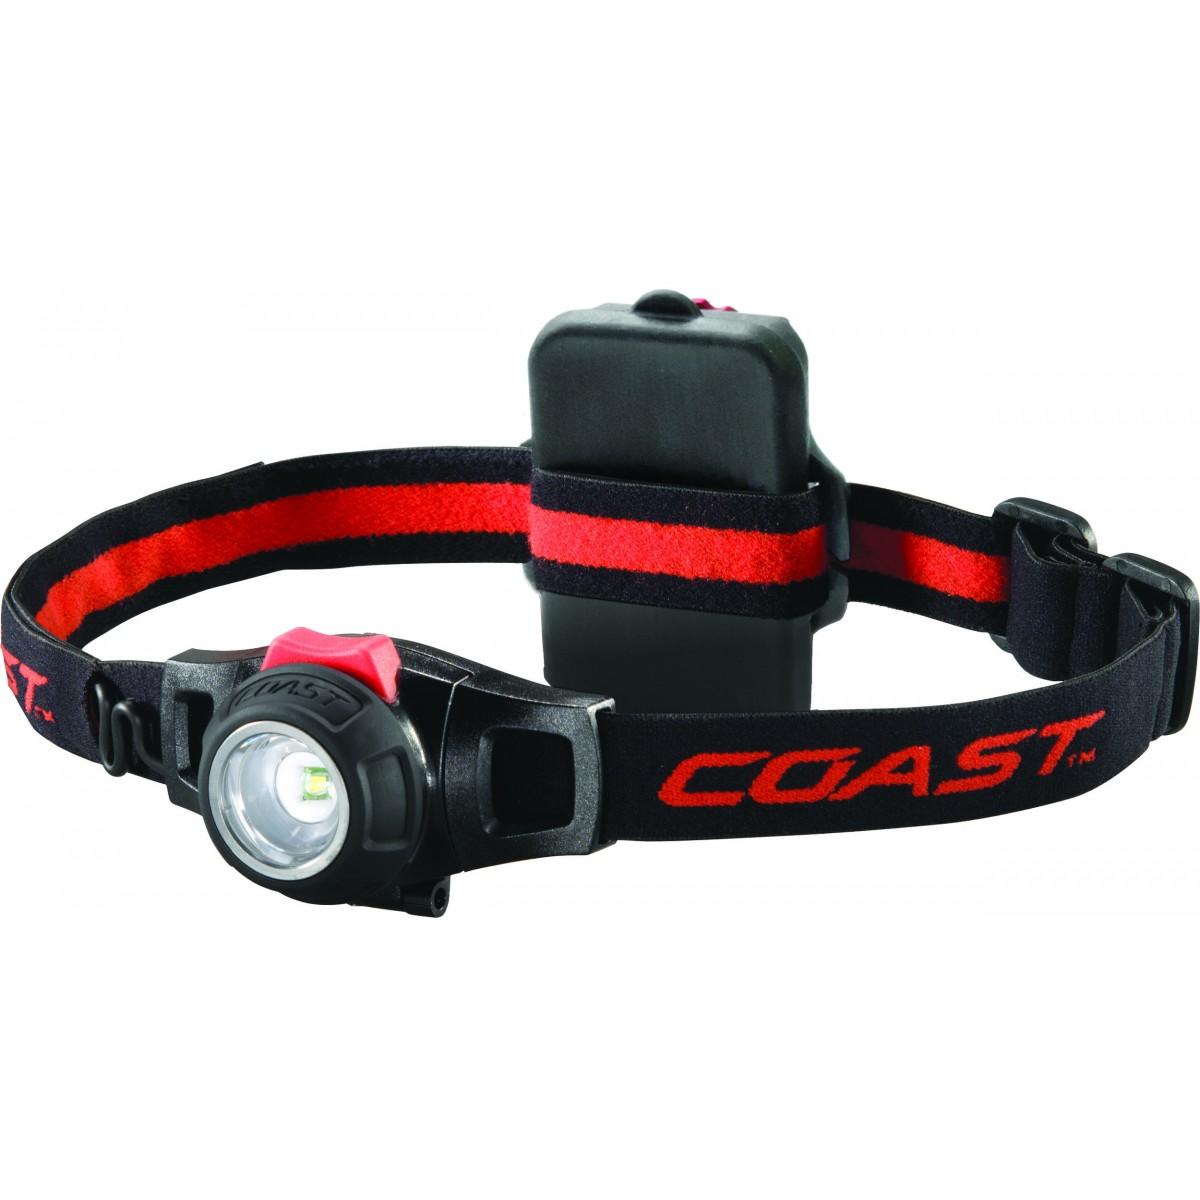 Coast HL7 LED Pandelmpe-31